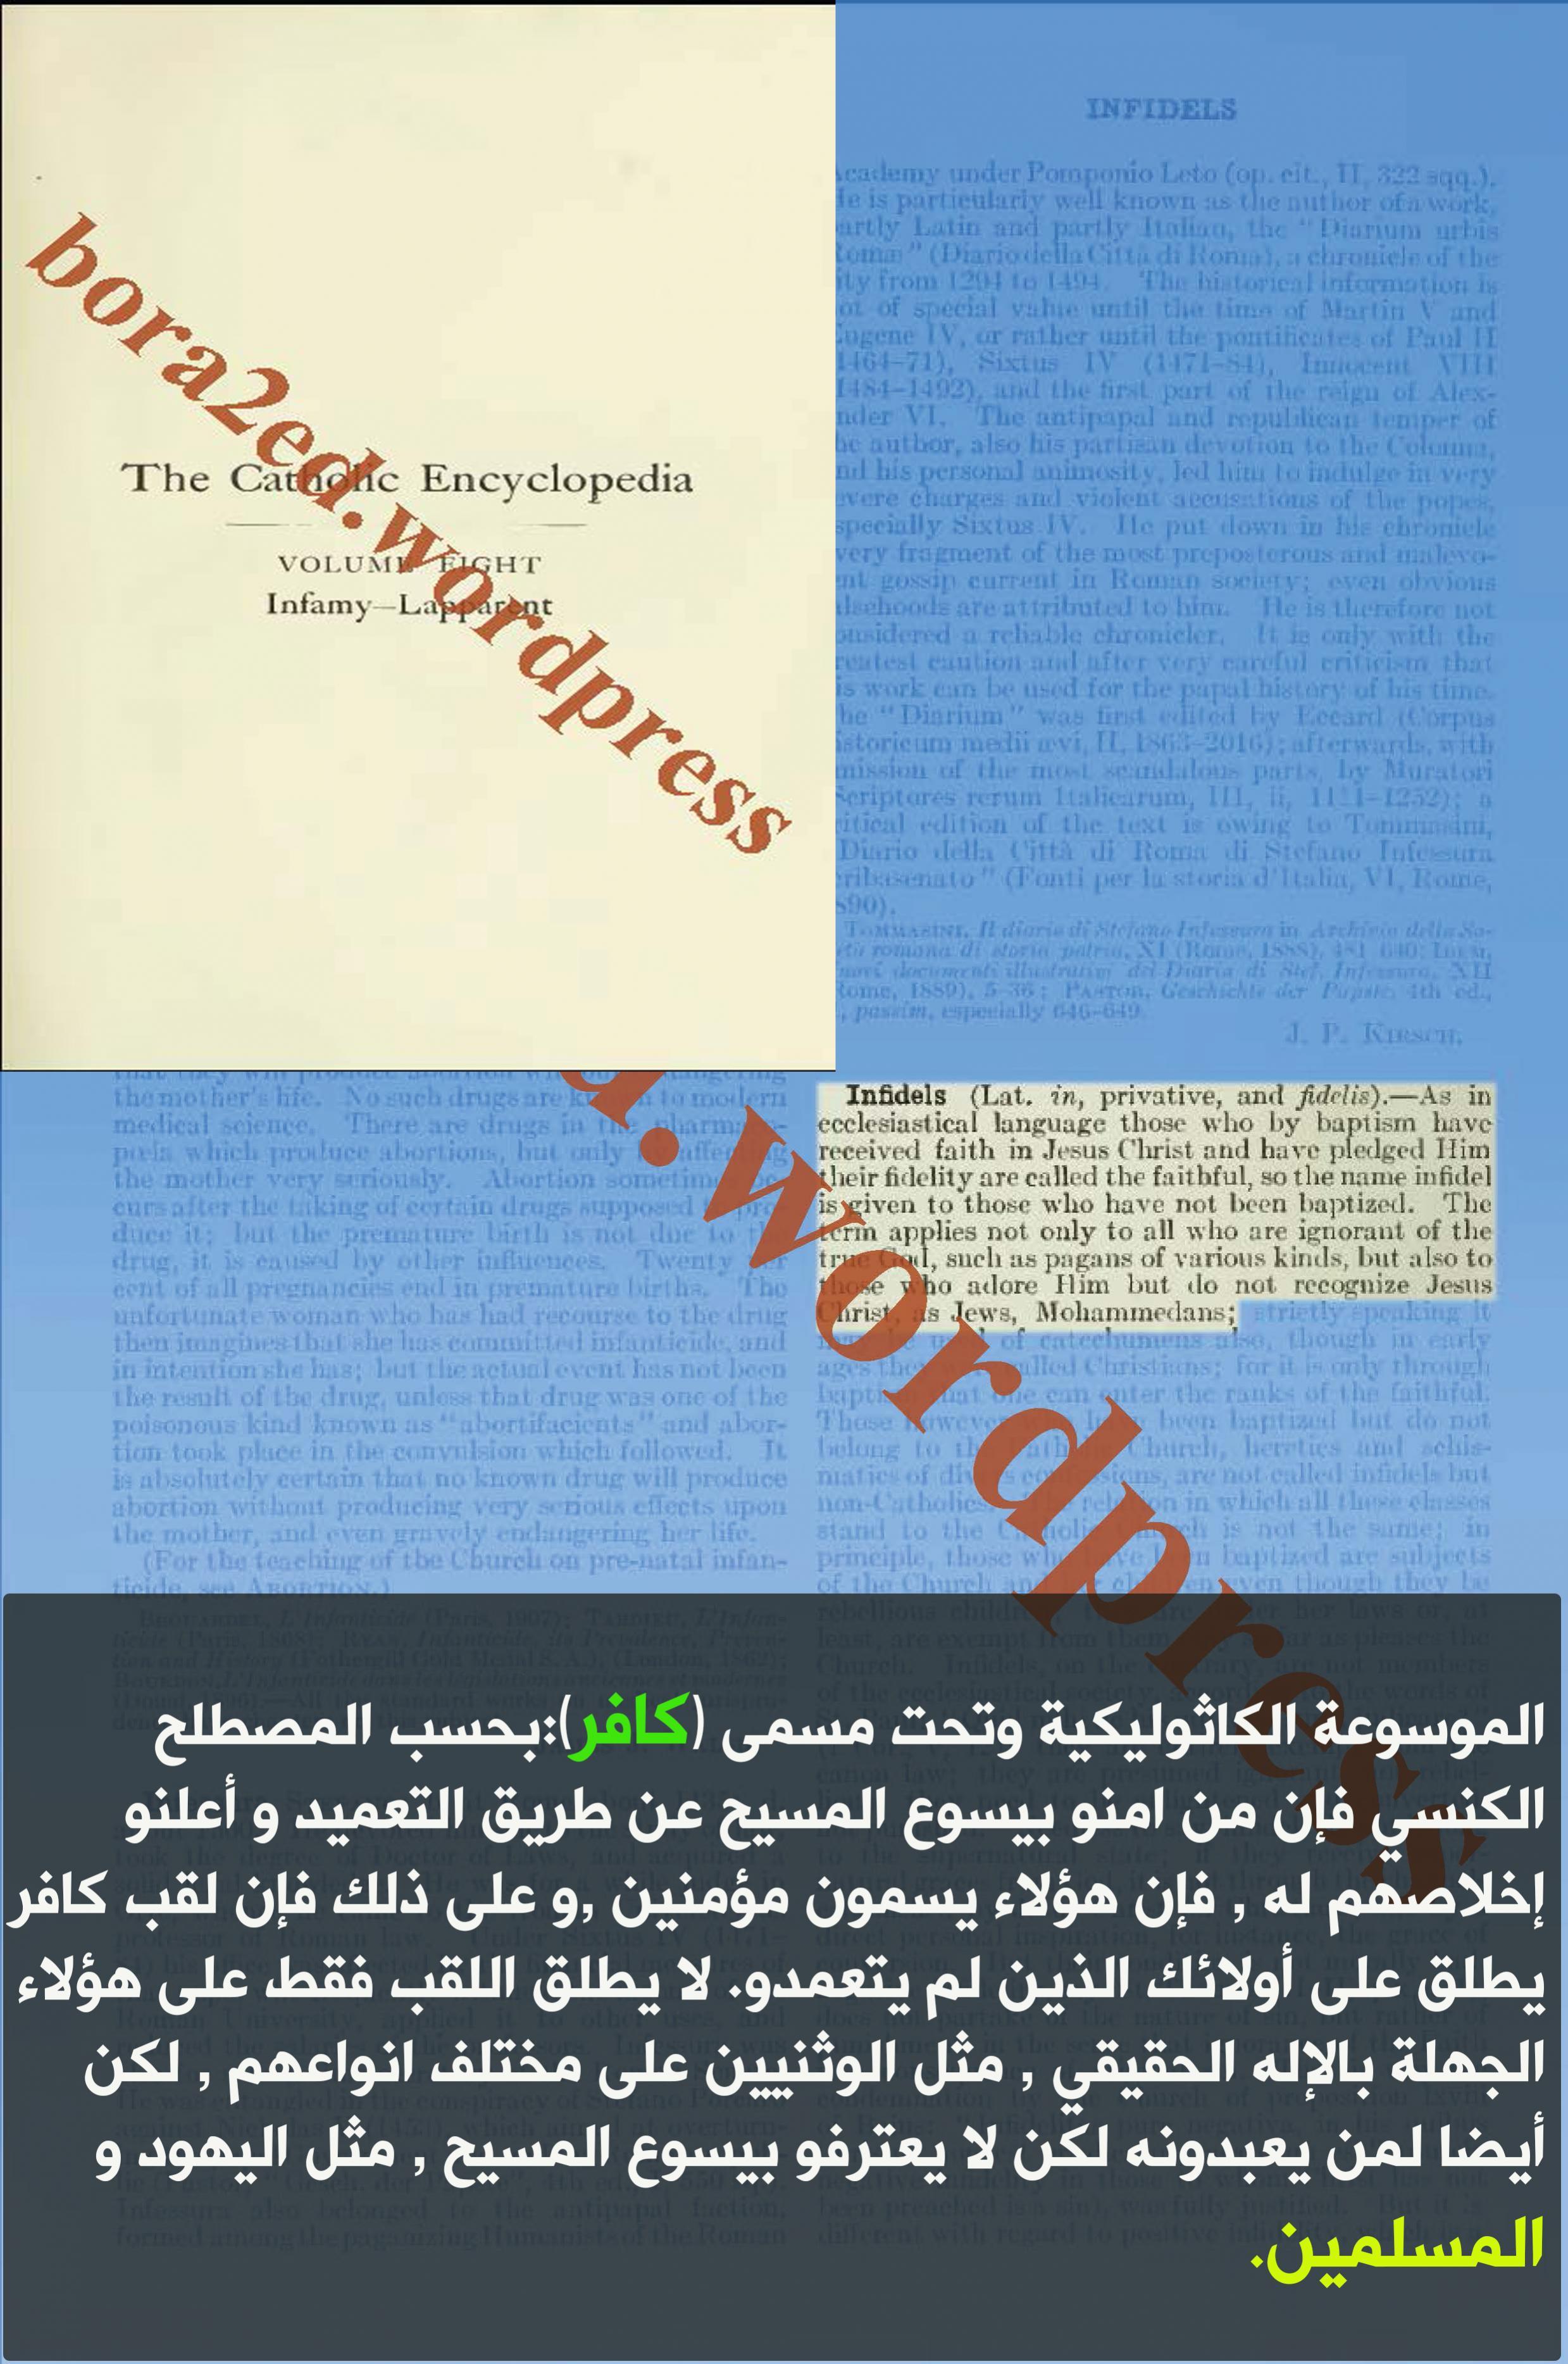 ���� ��� ������ ���� ����.  �����:binder2_page_30.jpg �������:262 �����:685.2 �������� ������:15019